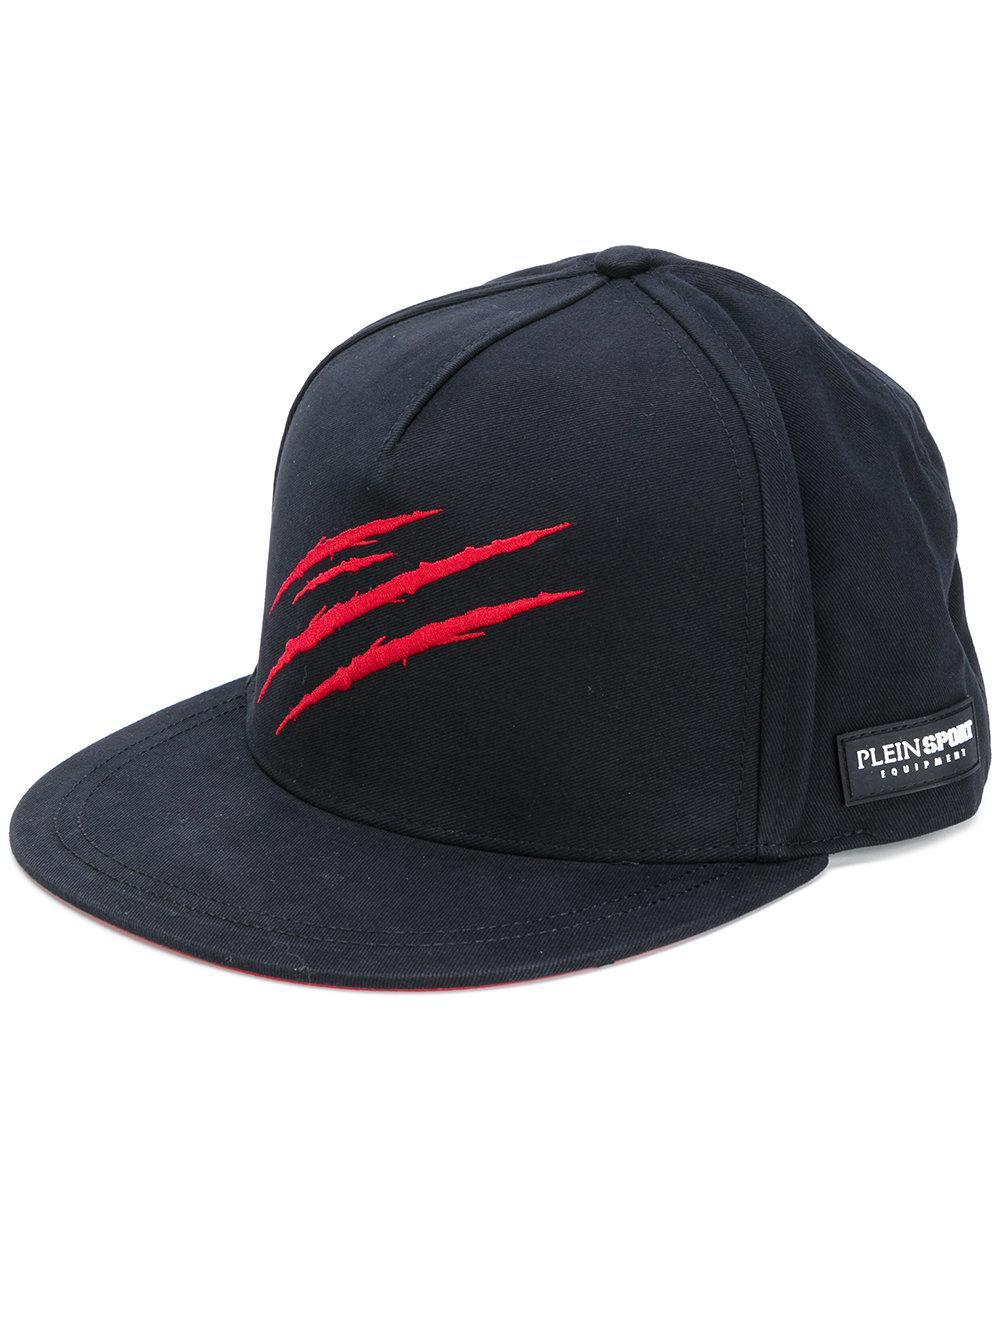 philipp plein embroidered scratch cap in black for men lyst. Black Bedroom Furniture Sets. Home Design Ideas